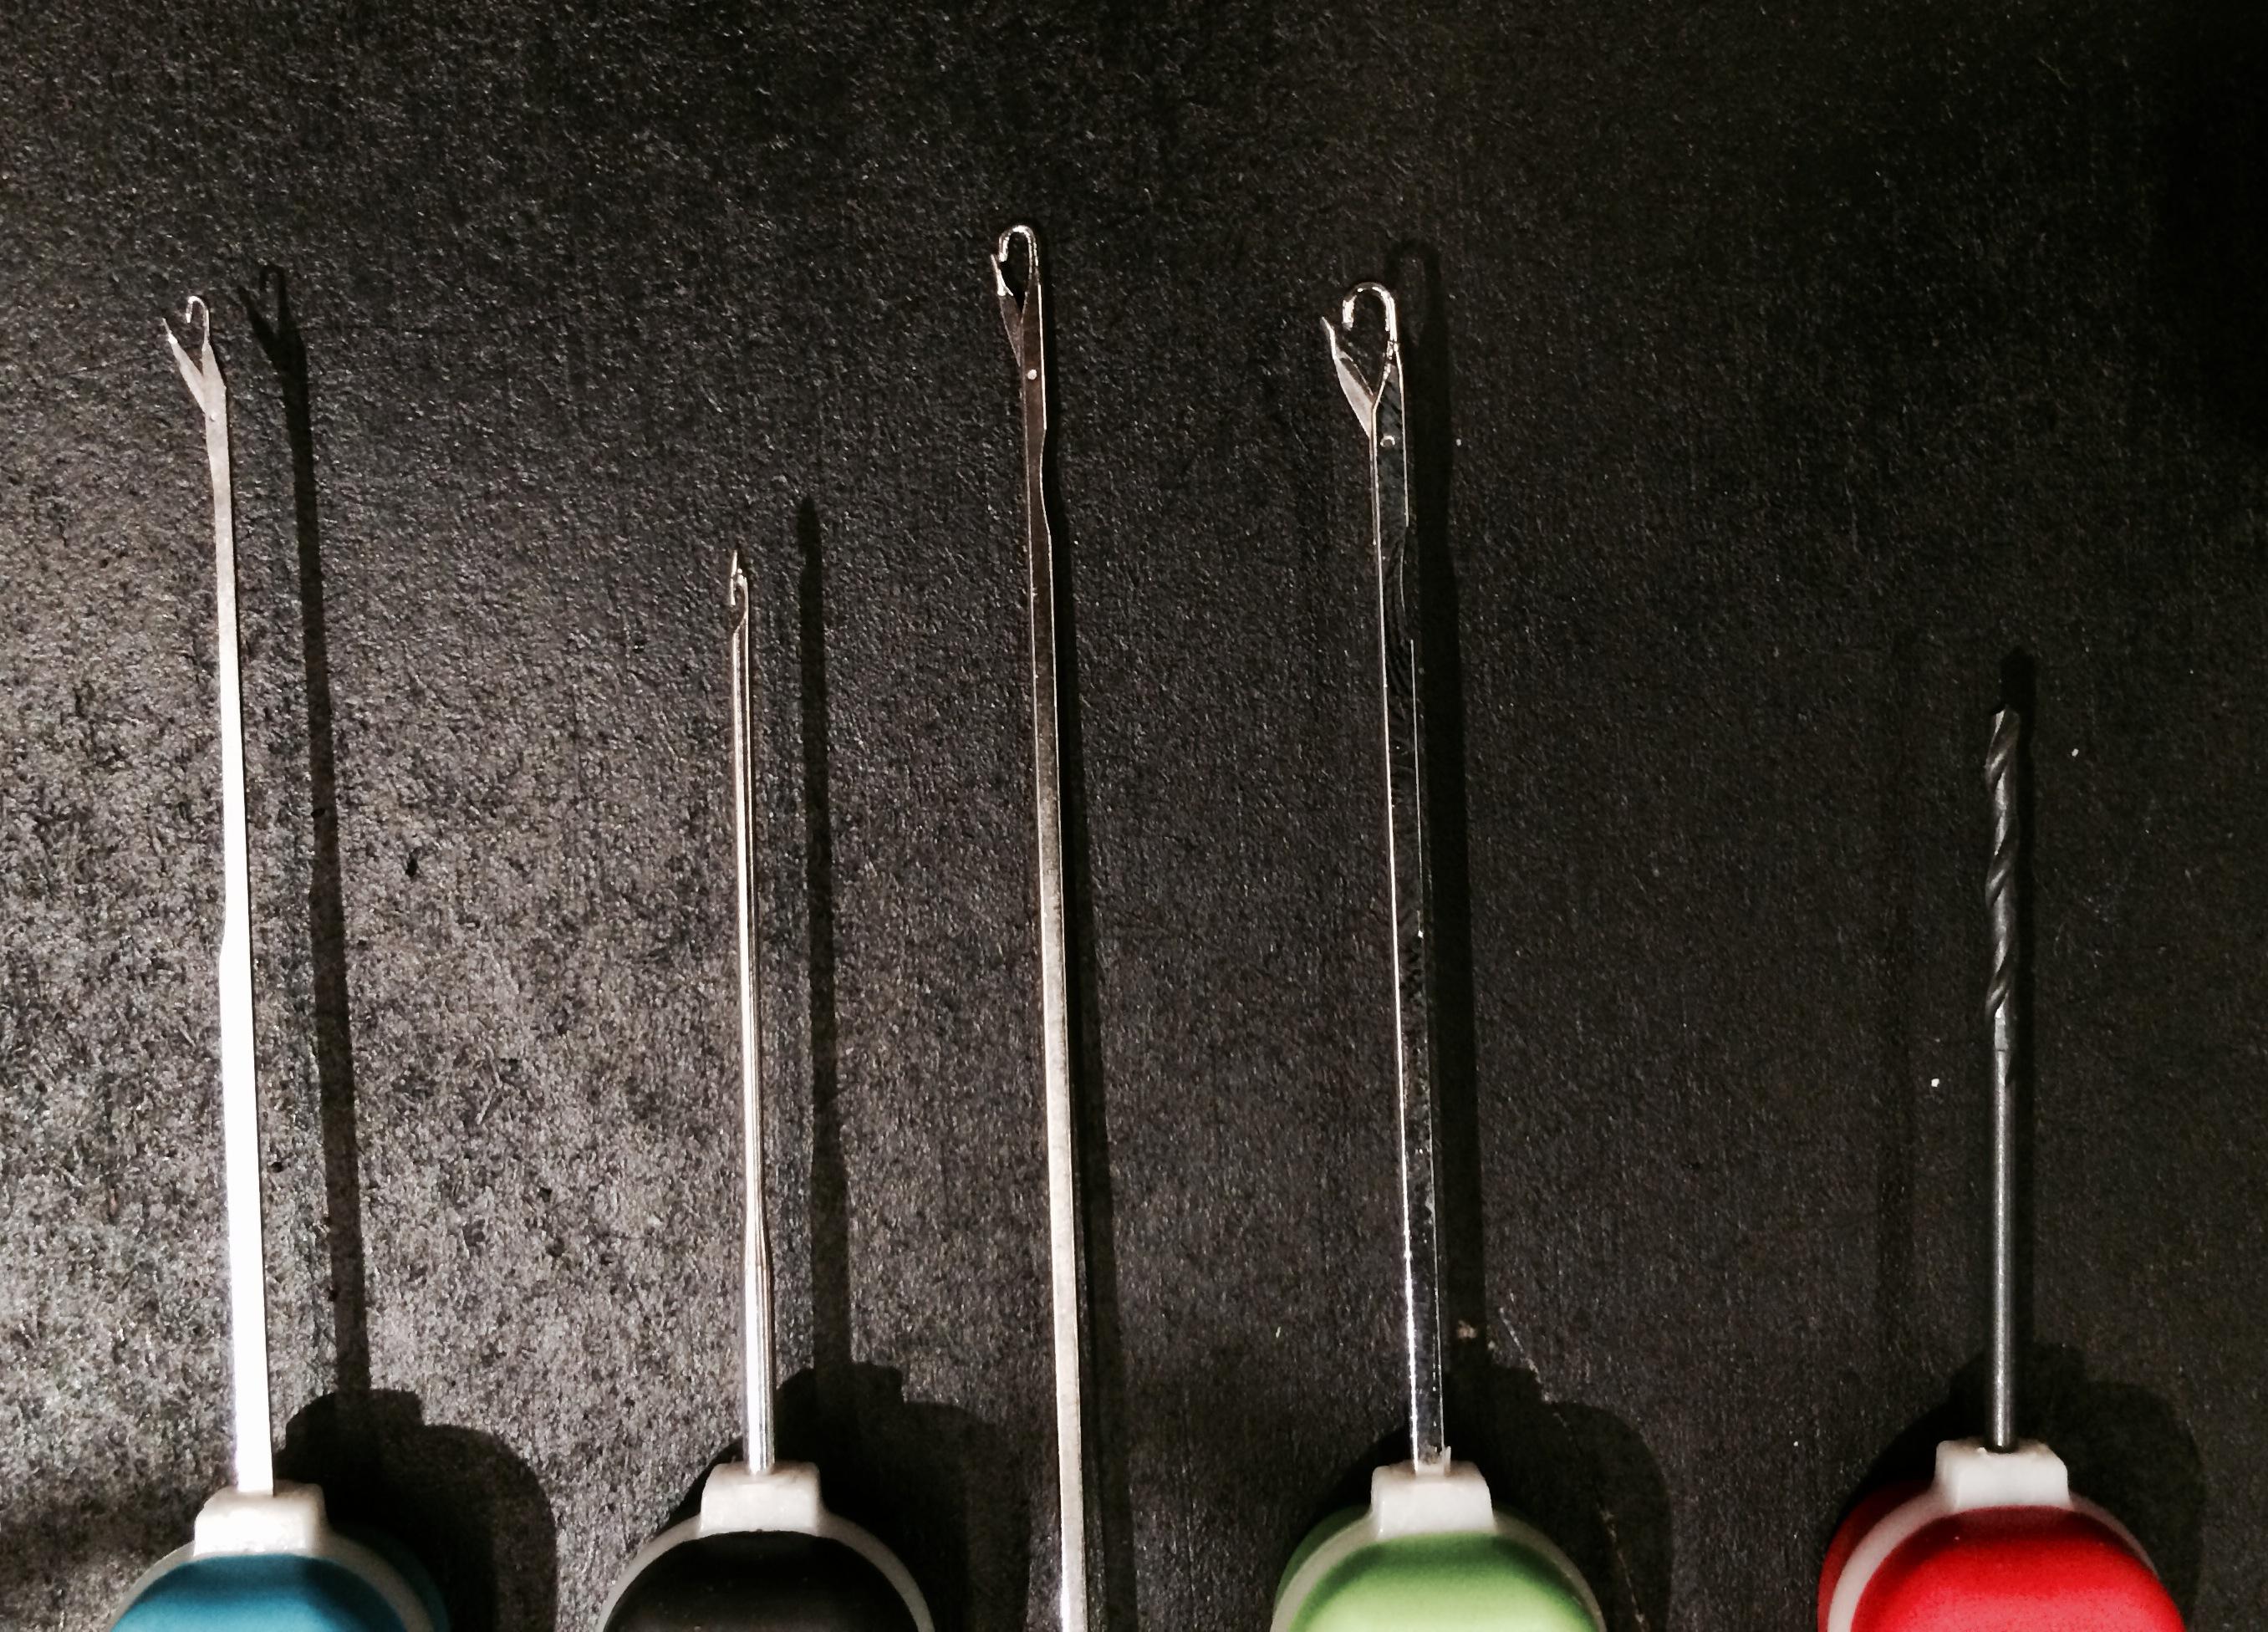 IMG 6541 -  - made in Germany, Endtackle, Carpleads.de, Carpfishing, Boilienadeln, Bleie, Bait tools